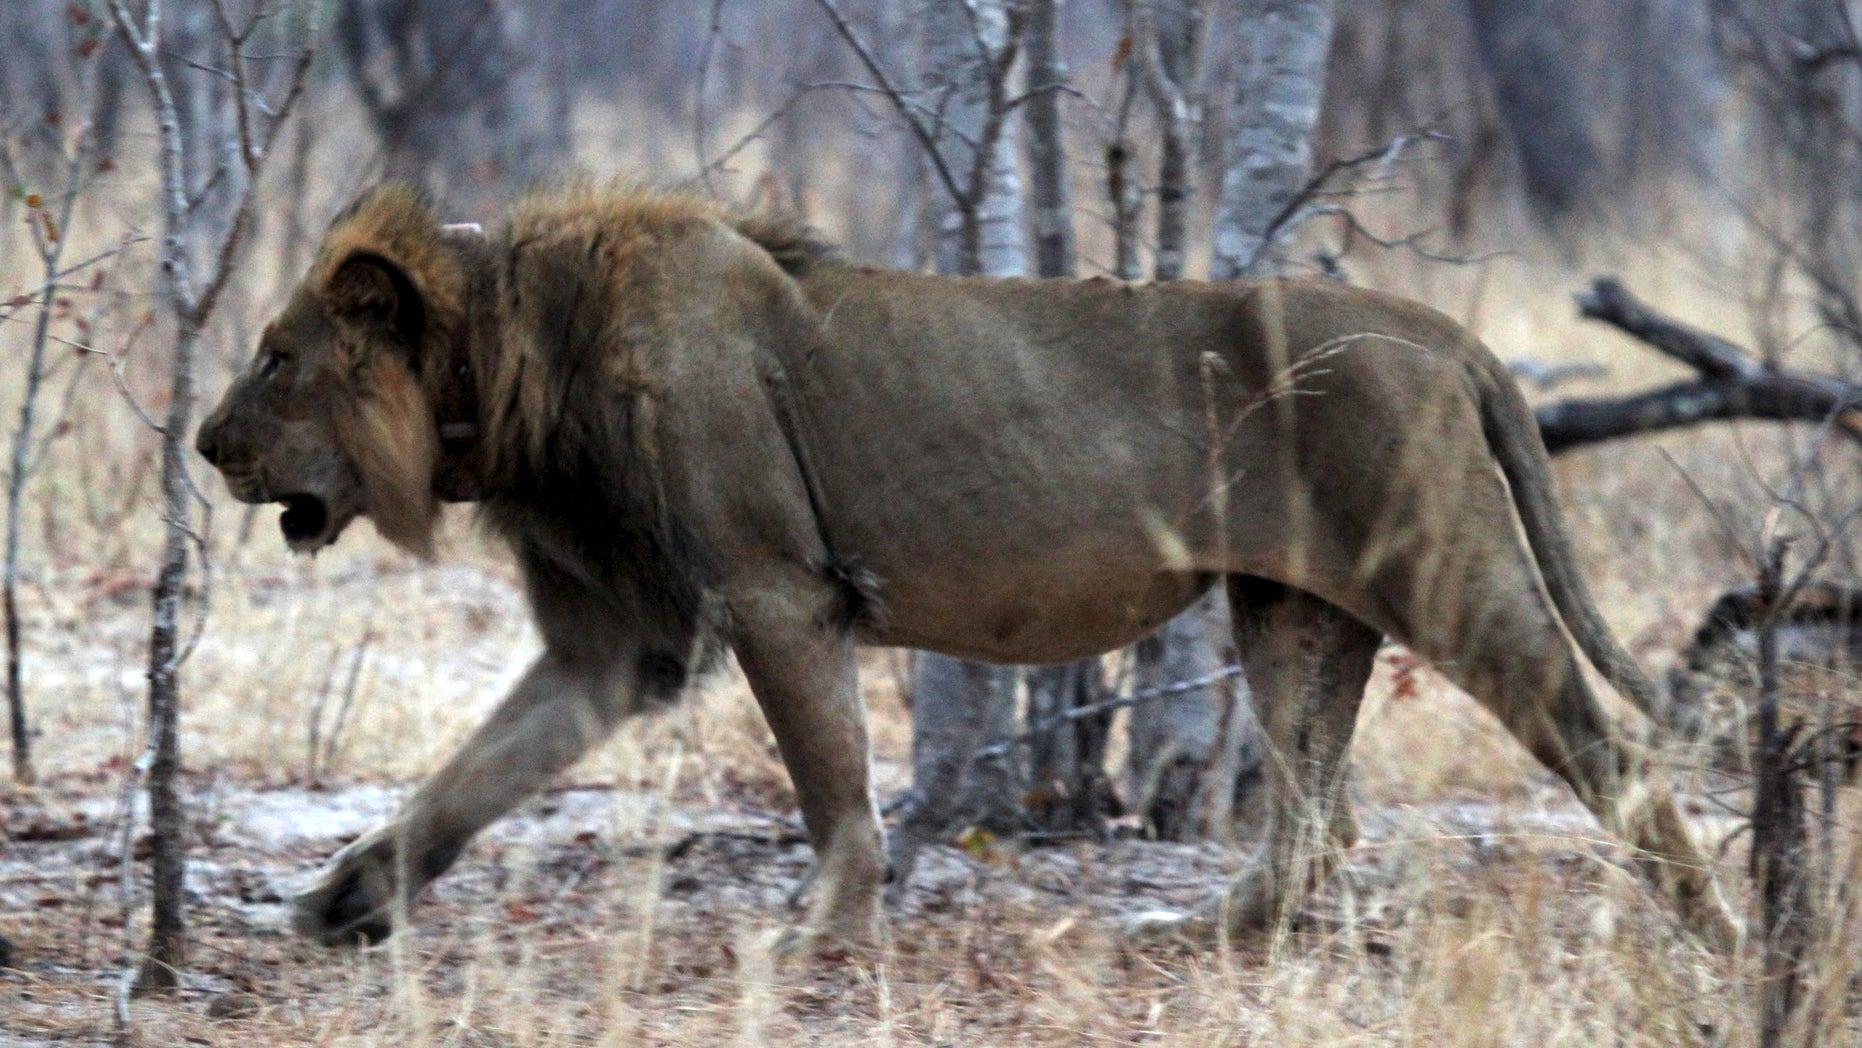 A lion in its enclosure. (Reuters)